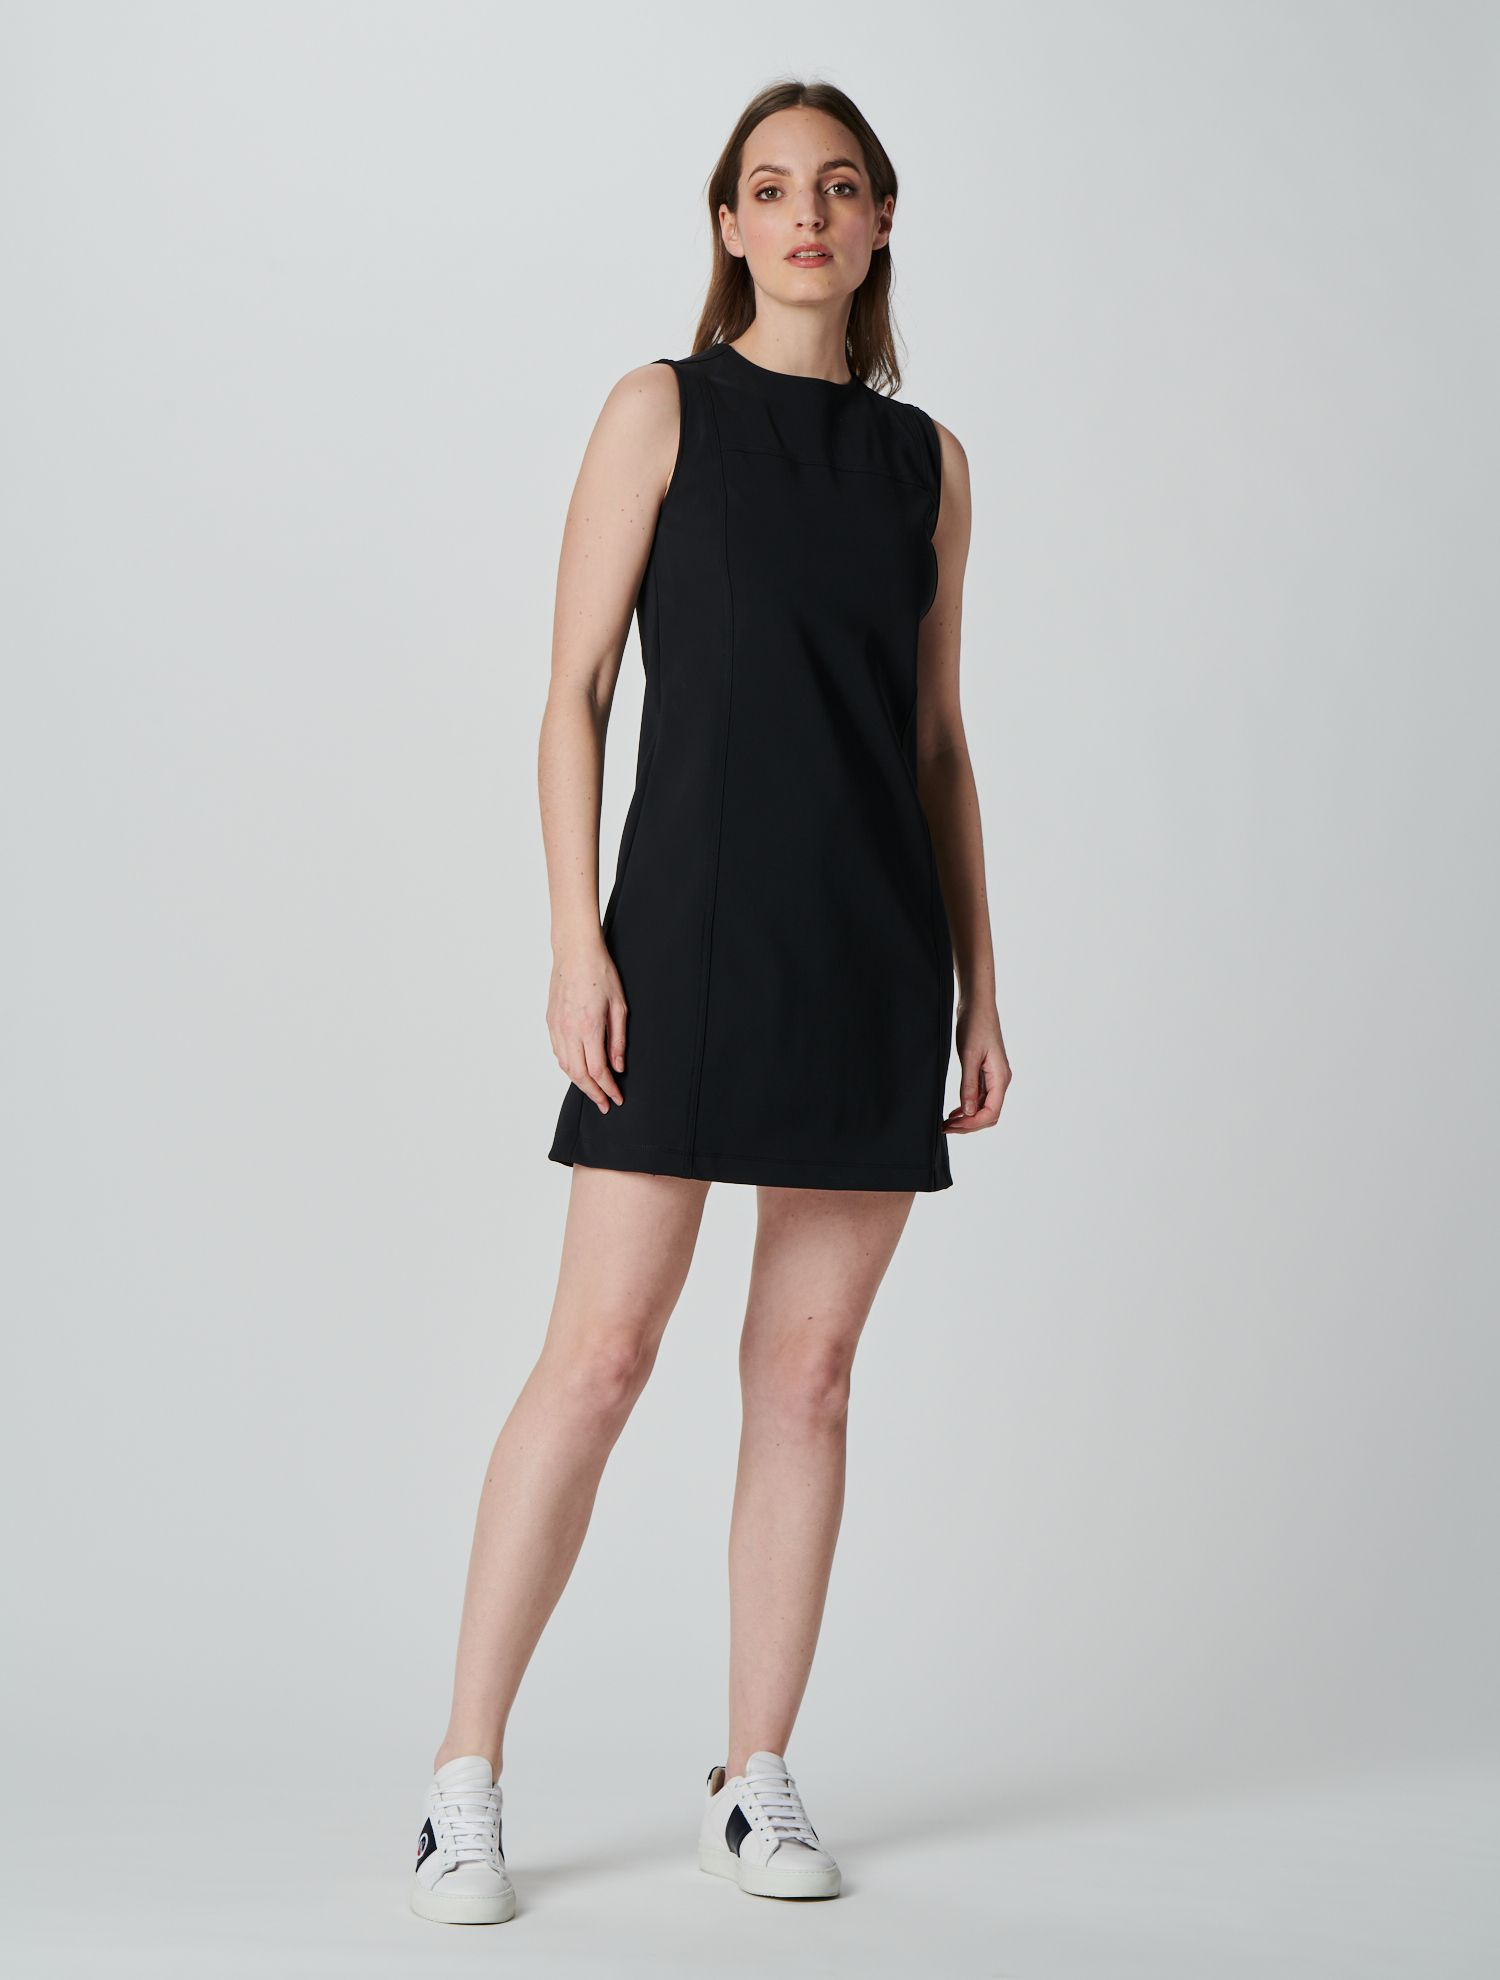 ALISSAS DRESS